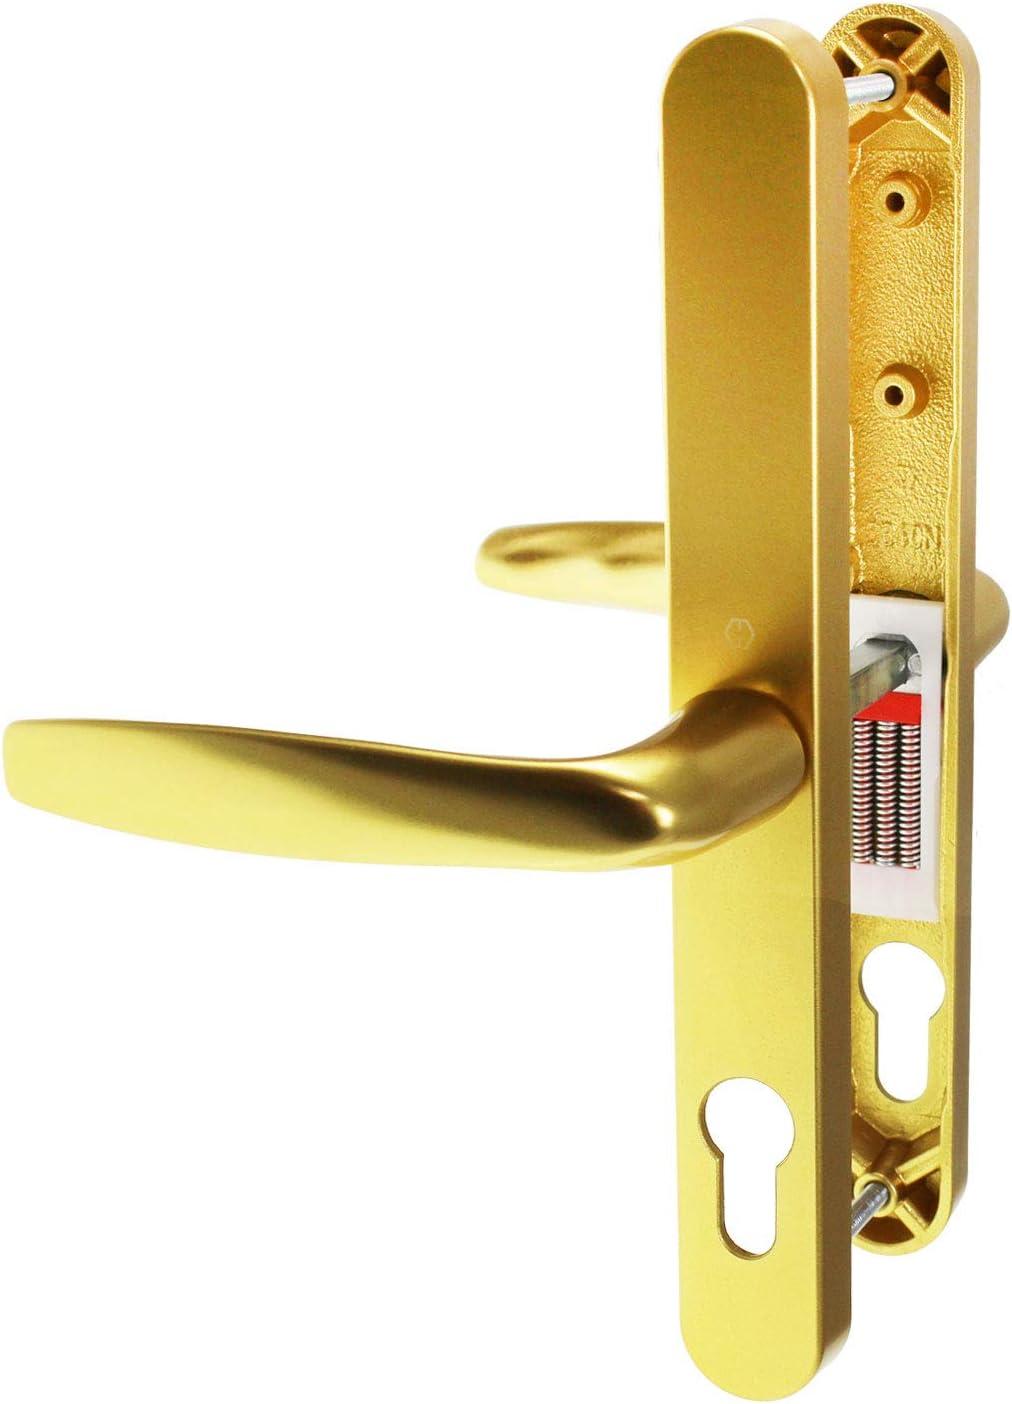 Fullex 68PZ Lever both sides Sprung UPVC Door Handle 68mm White Gold Chrome